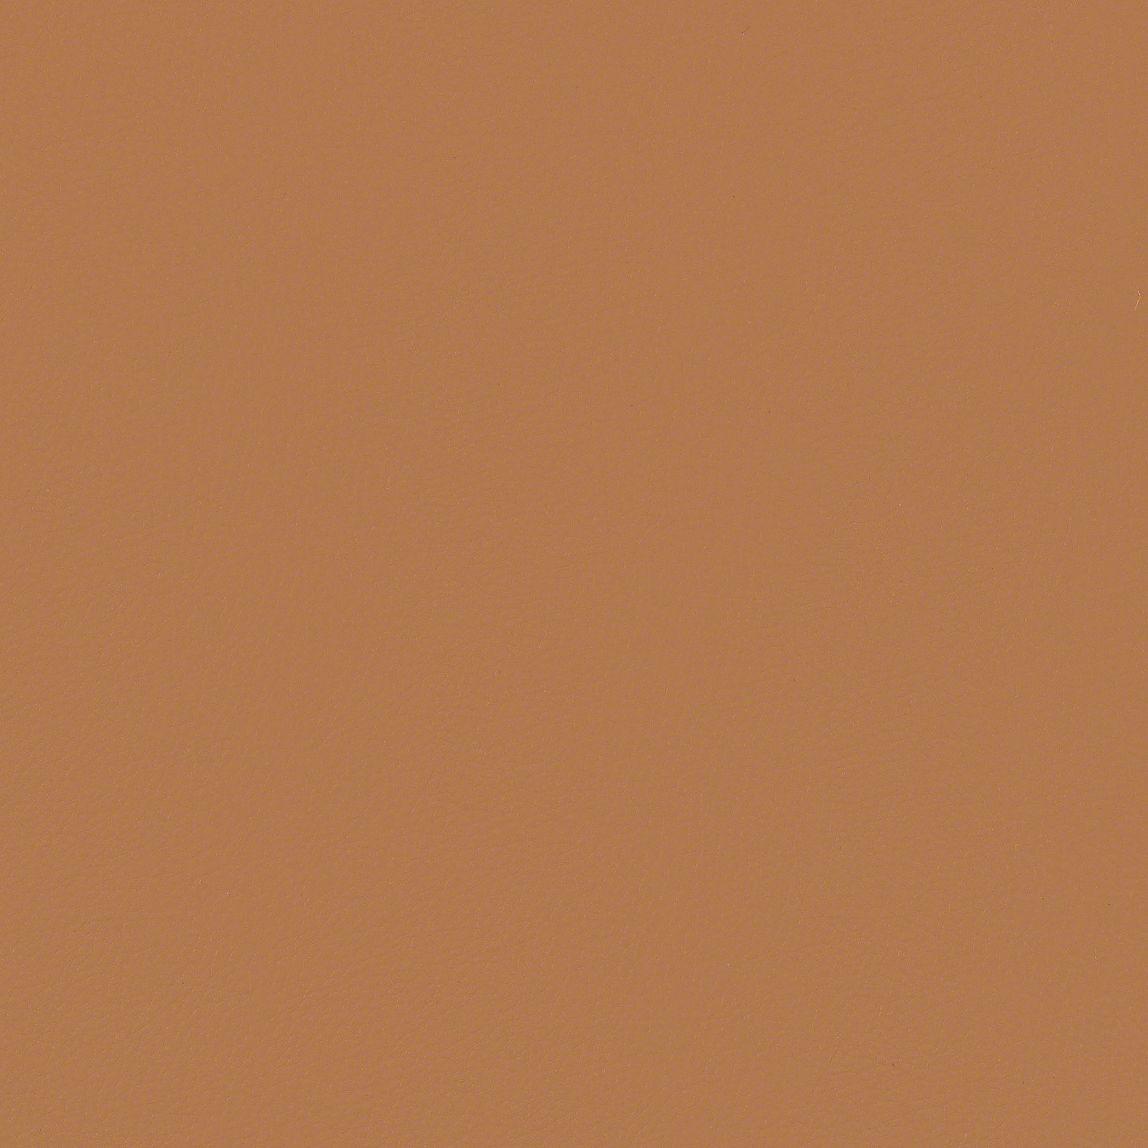 Silicone-Avail Pueblo Swatch